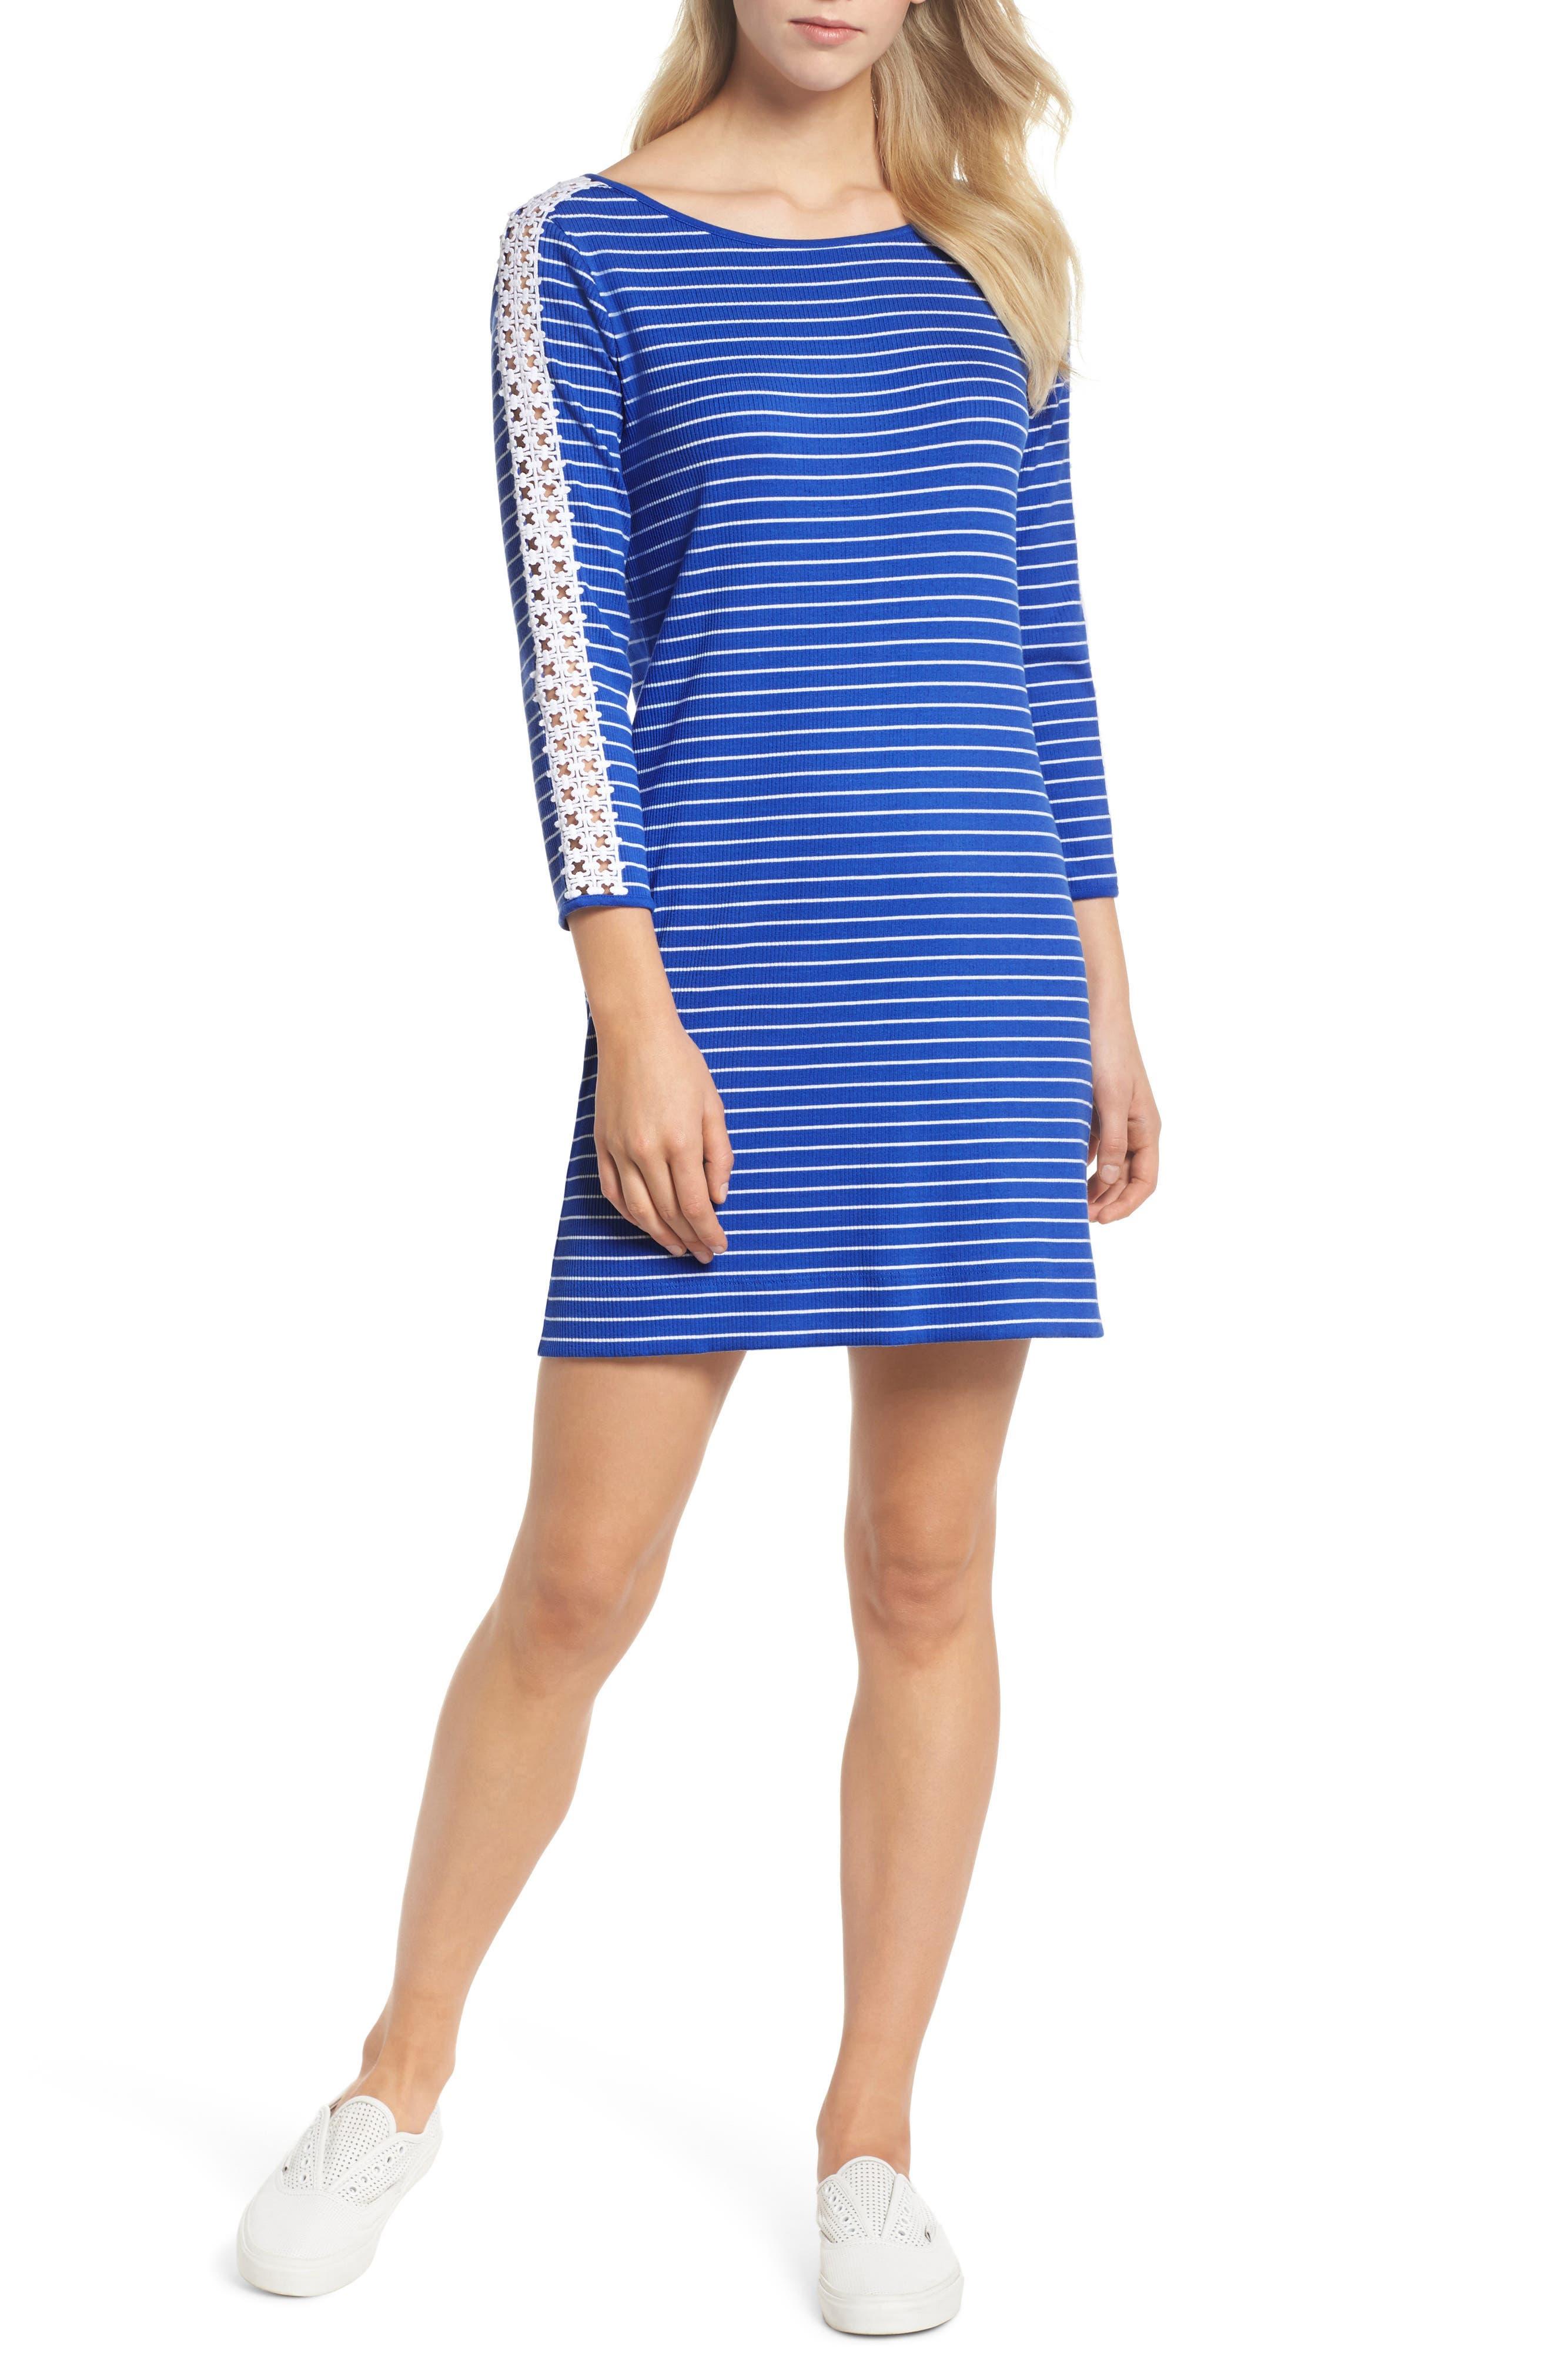 Marlowe Shift Dress,                             Main thumbnail 1, color,                             Beckon Blue Breeze Stripe